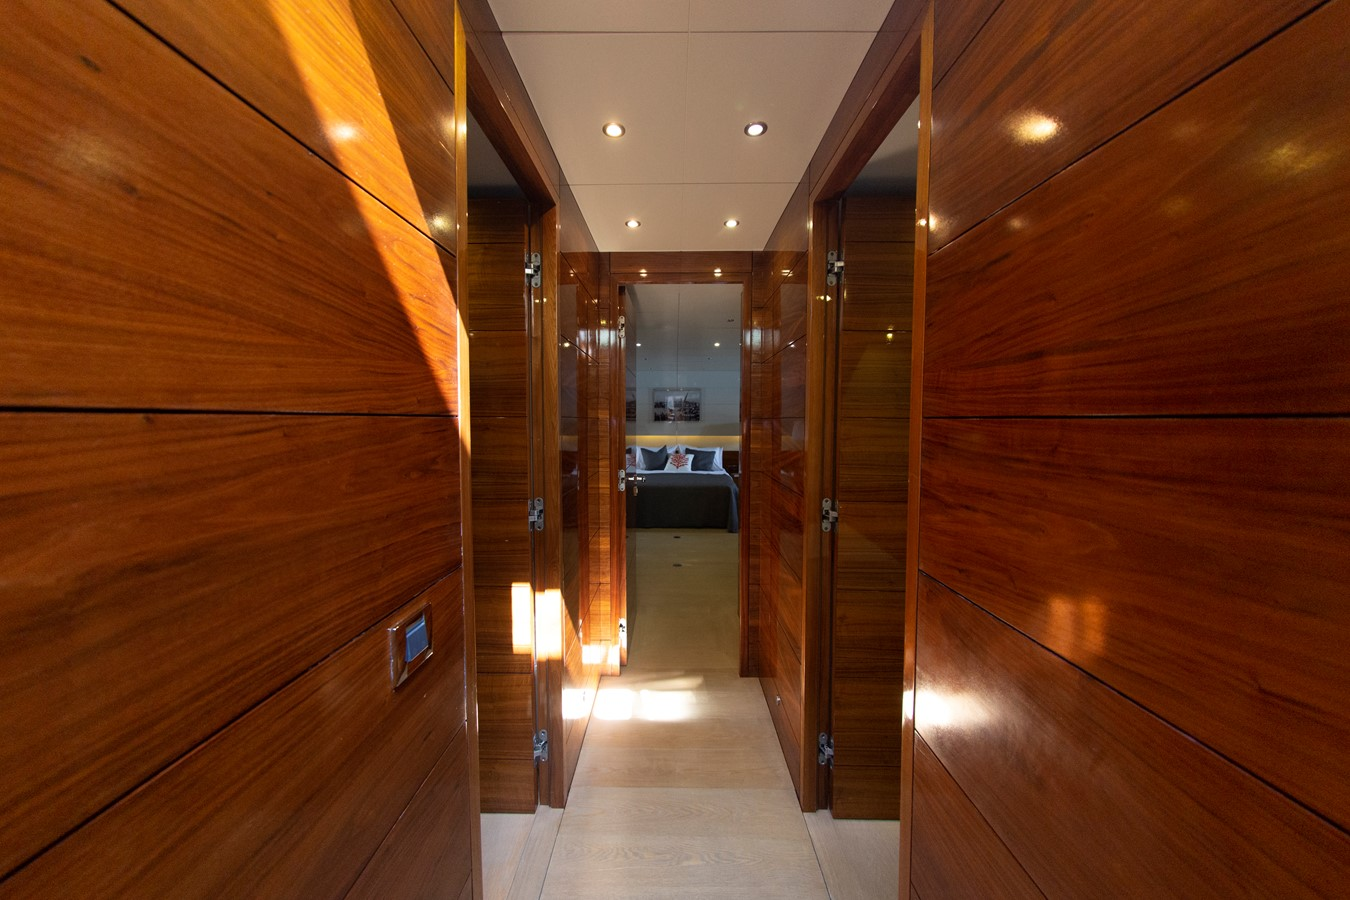 2012 Aydos Yatcilik  Performance Sailboat 2602960